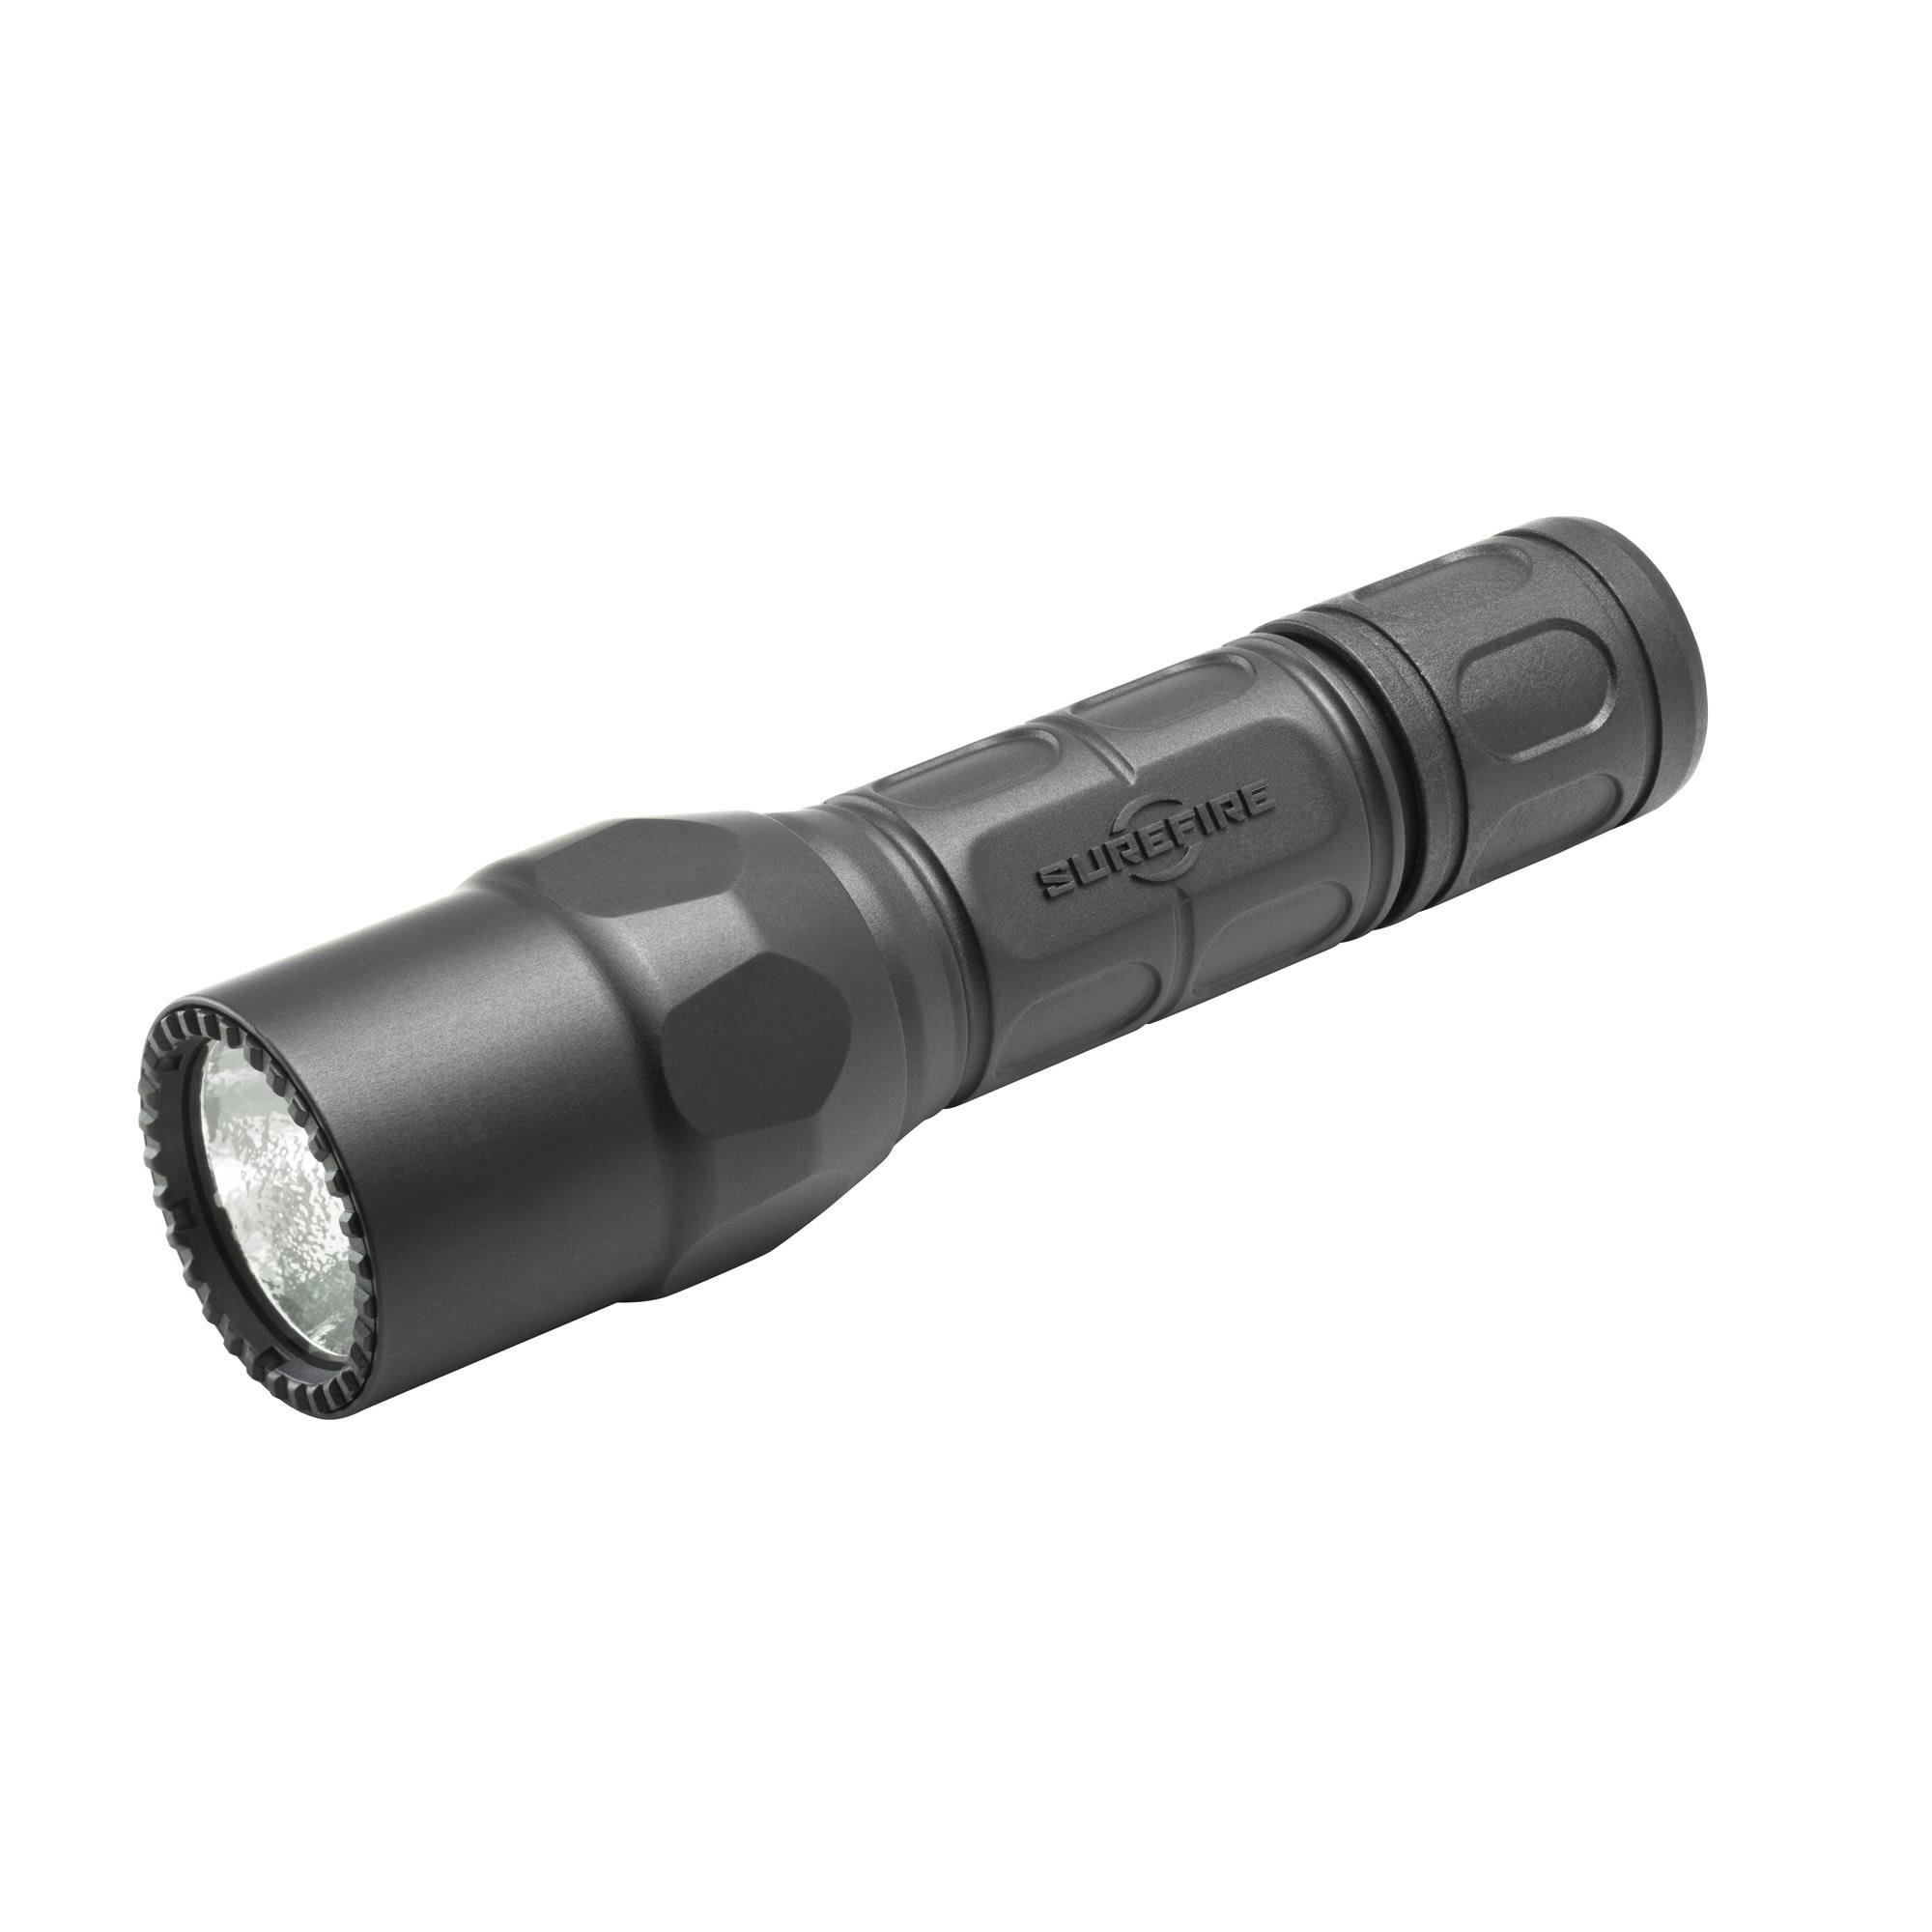 Surefire G2X PRO, 15/320 lumens, Black